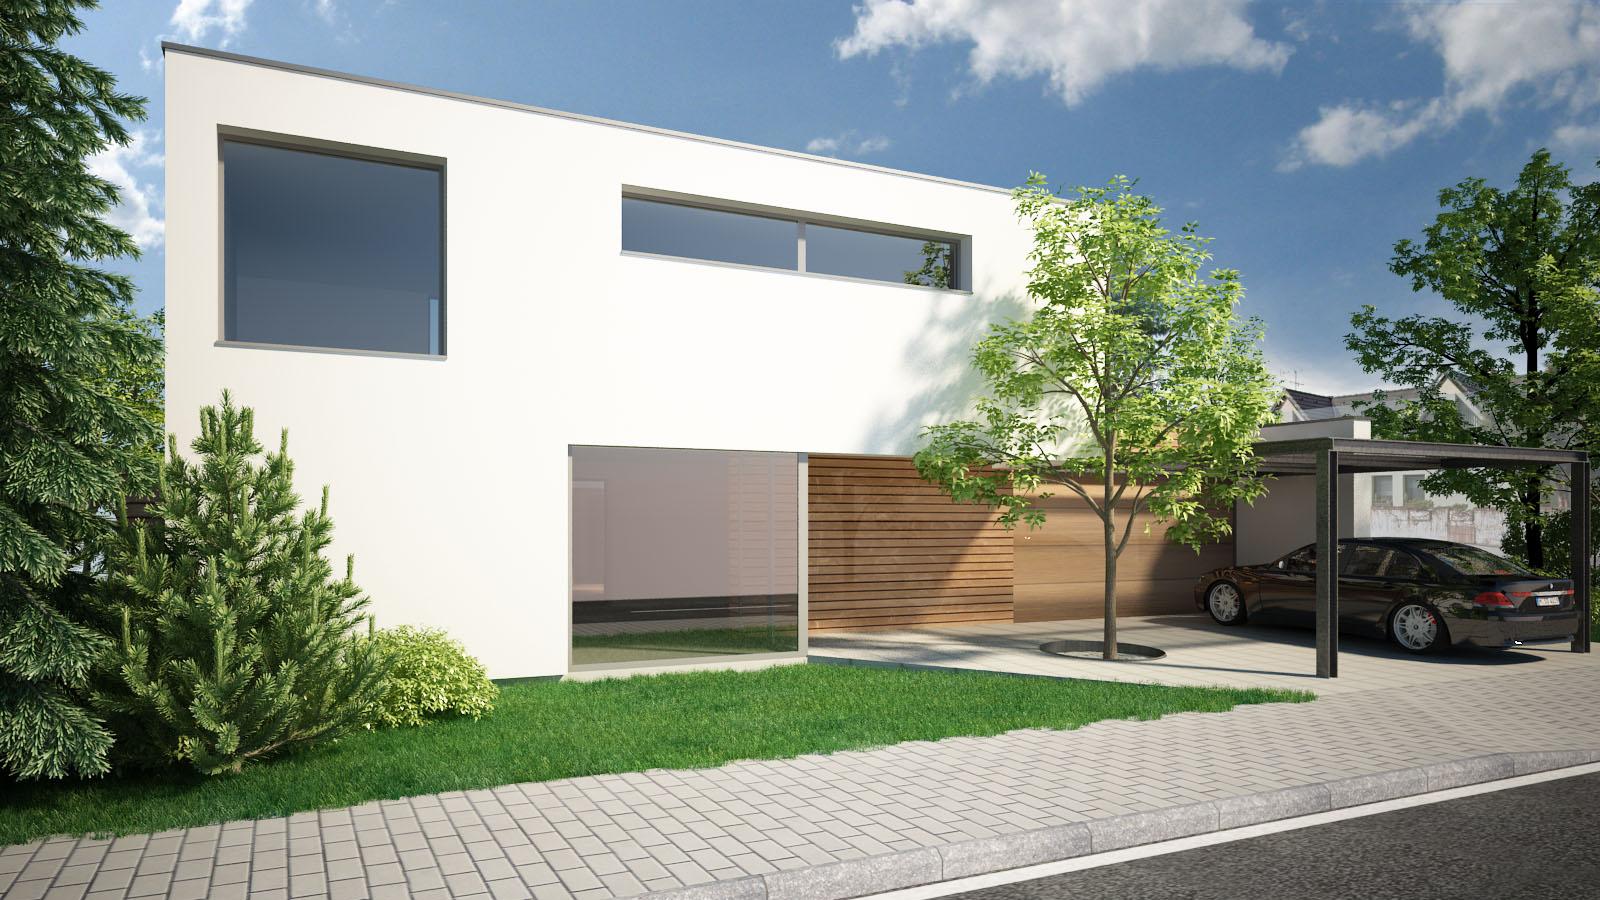 Rodinný dom, Trnava  Architektúra  Ungroup  Studio